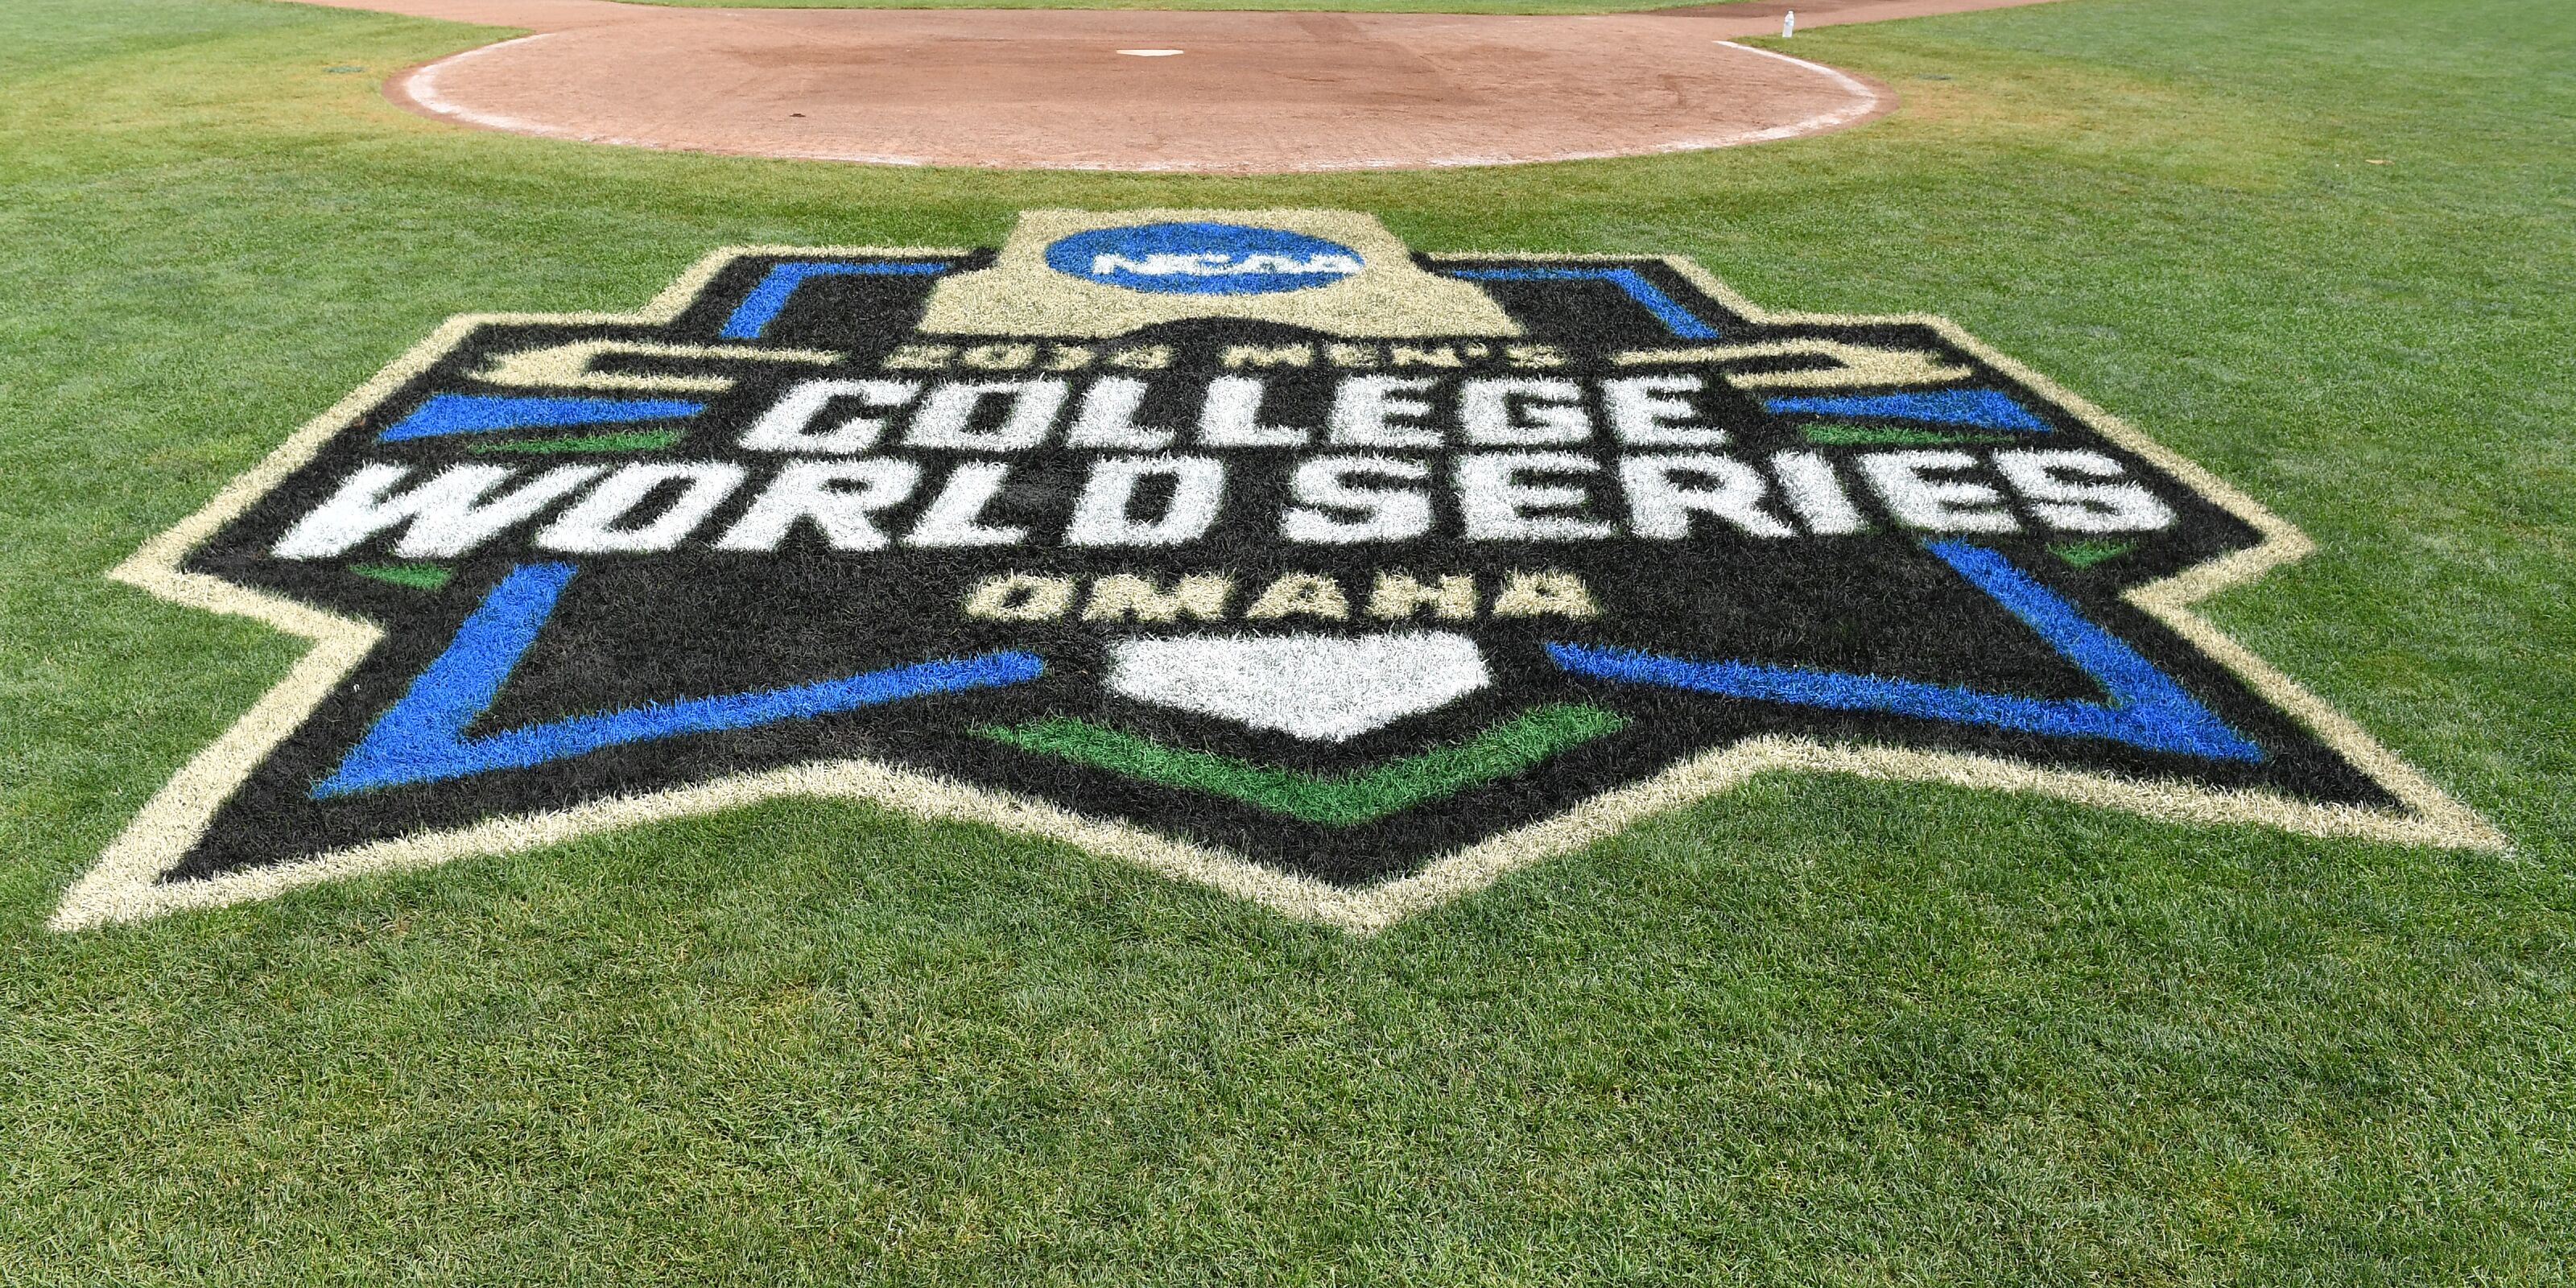 Clemson Baseball: Tigers look to upset Georgia Tech on the road